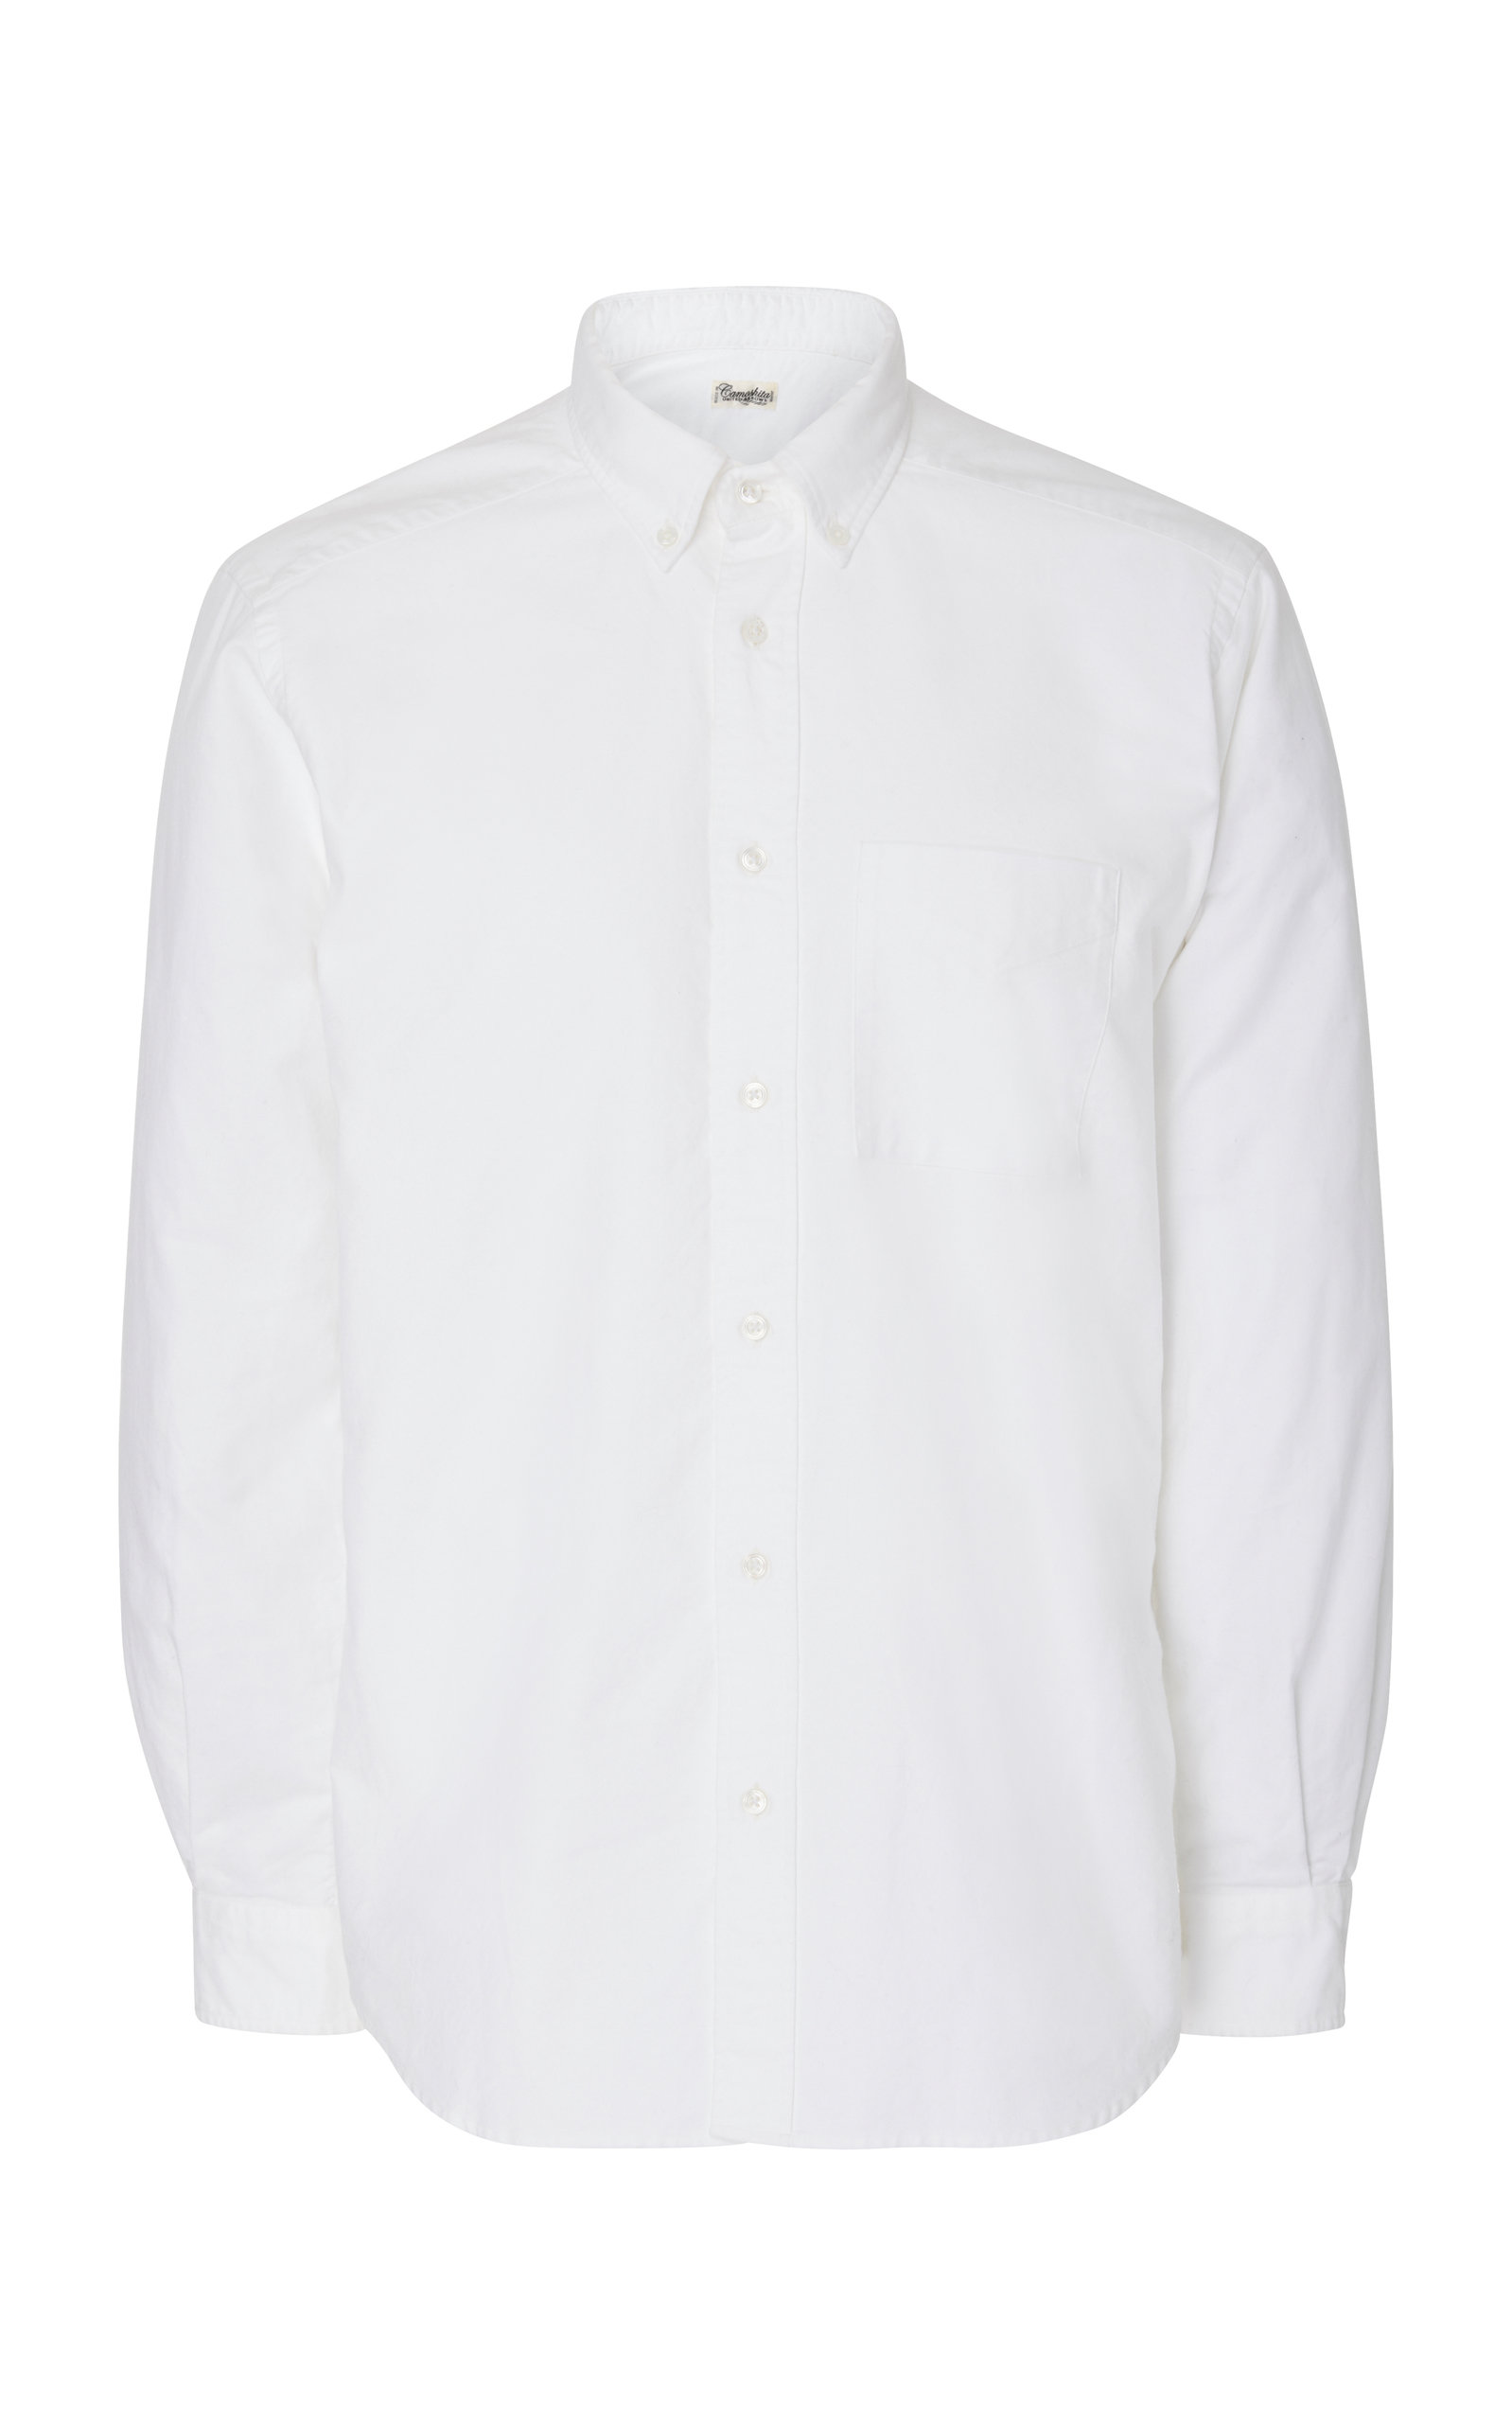 CAMOSHITA Button-Down Oxford Dress Shirt in White